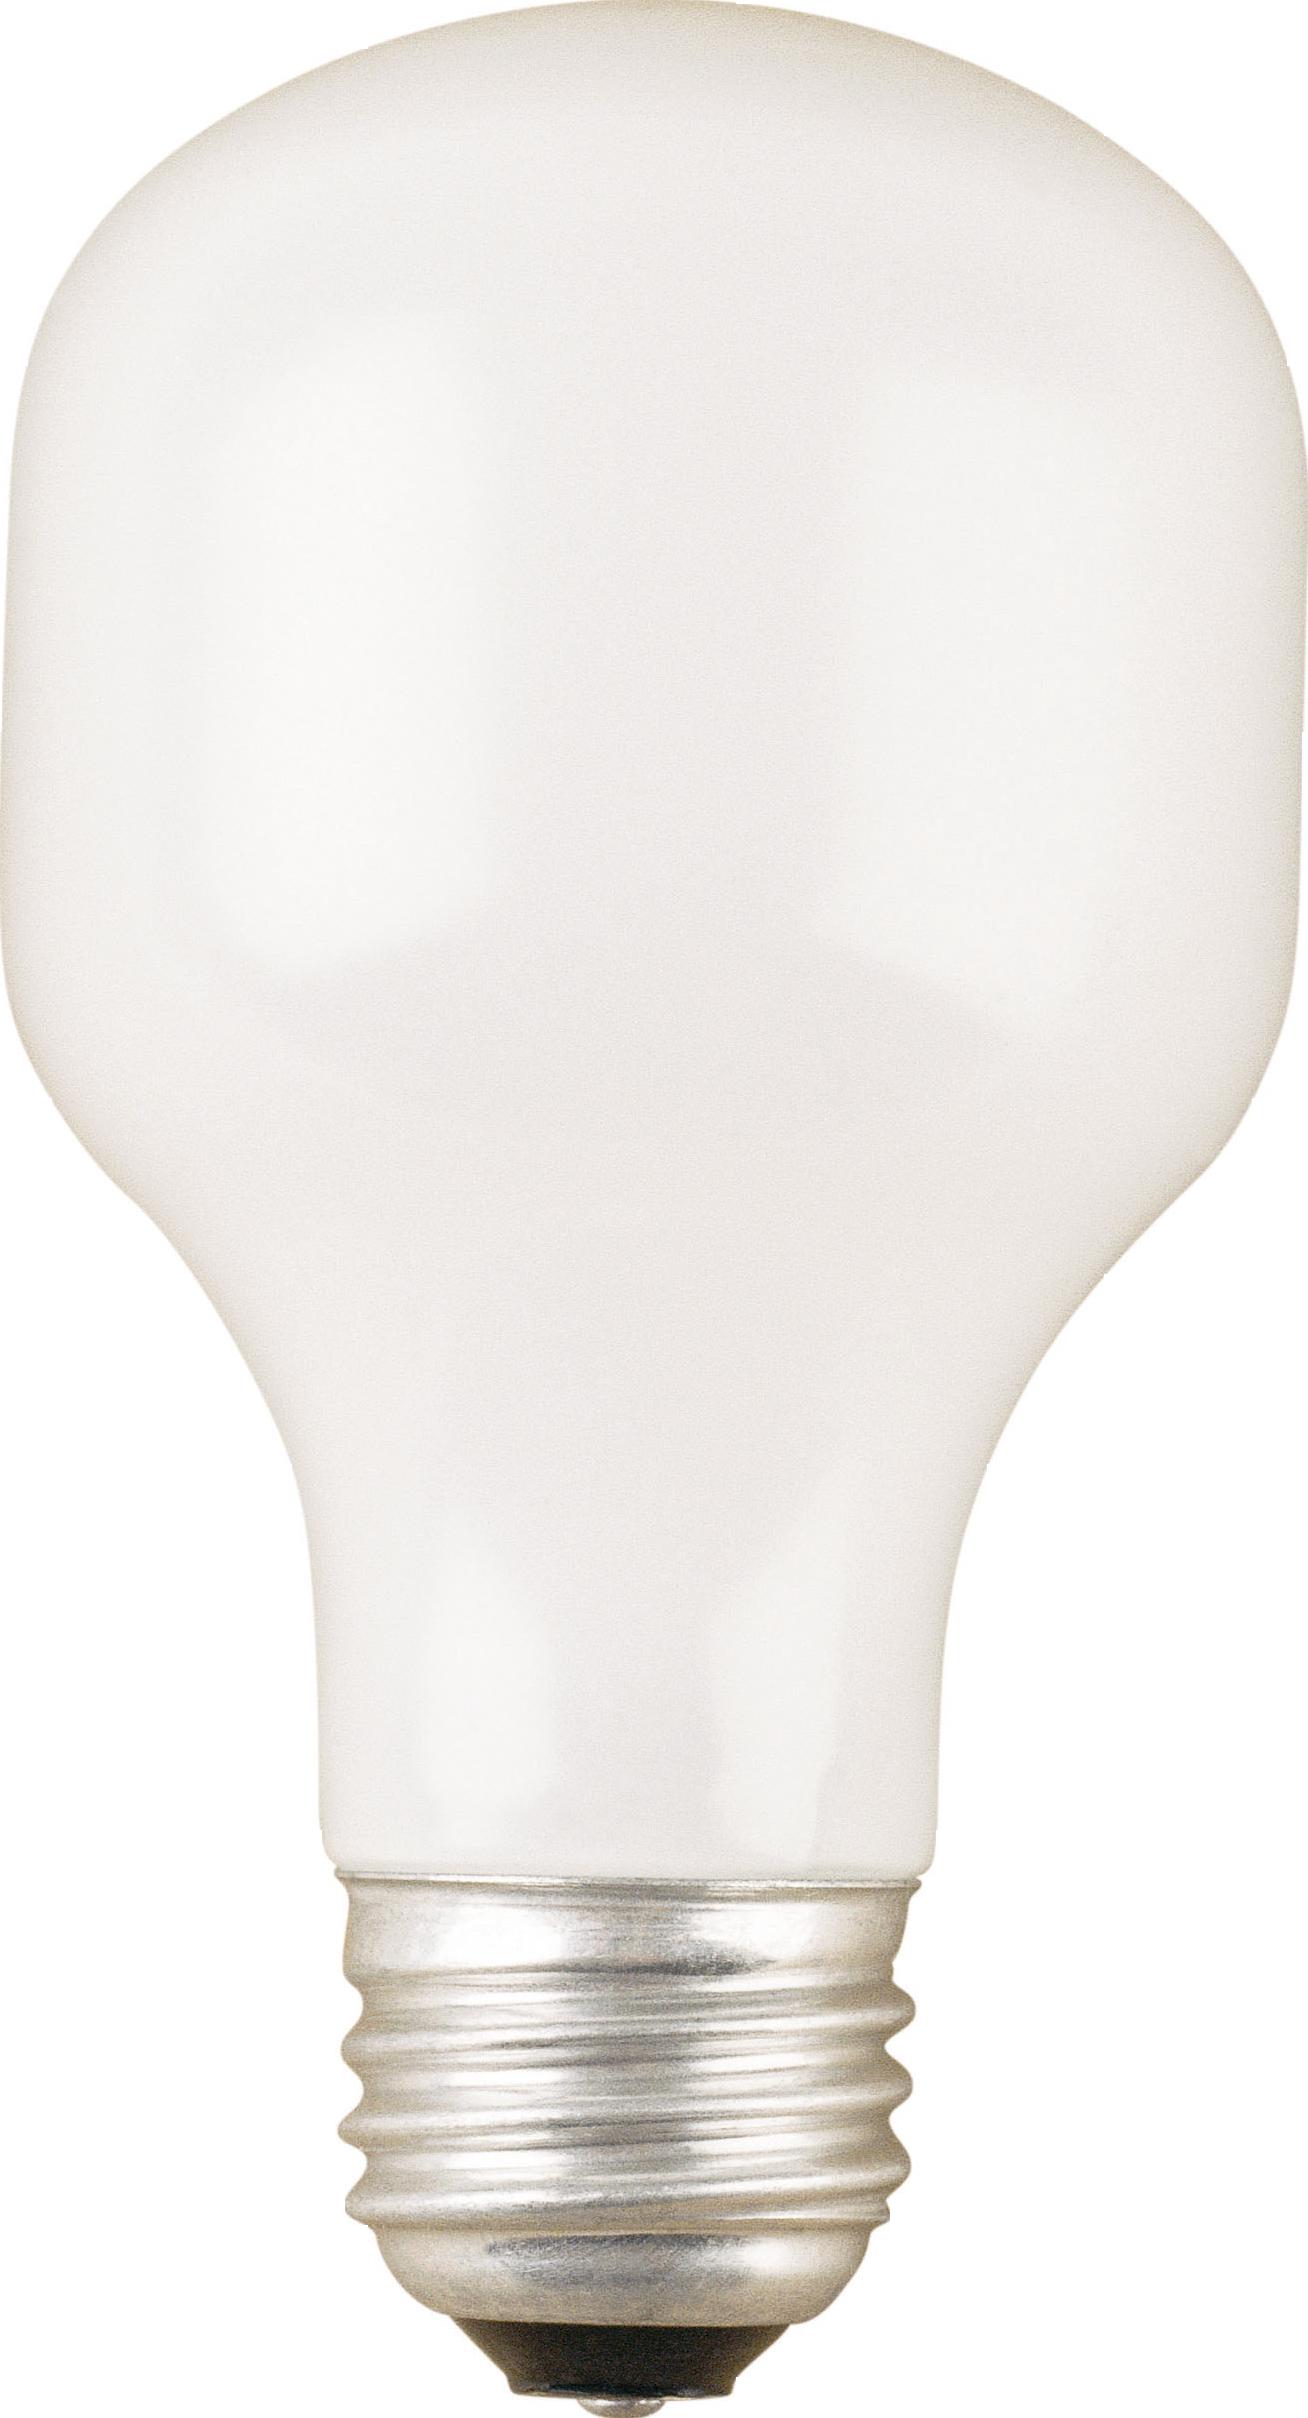 Lamp PNG Image